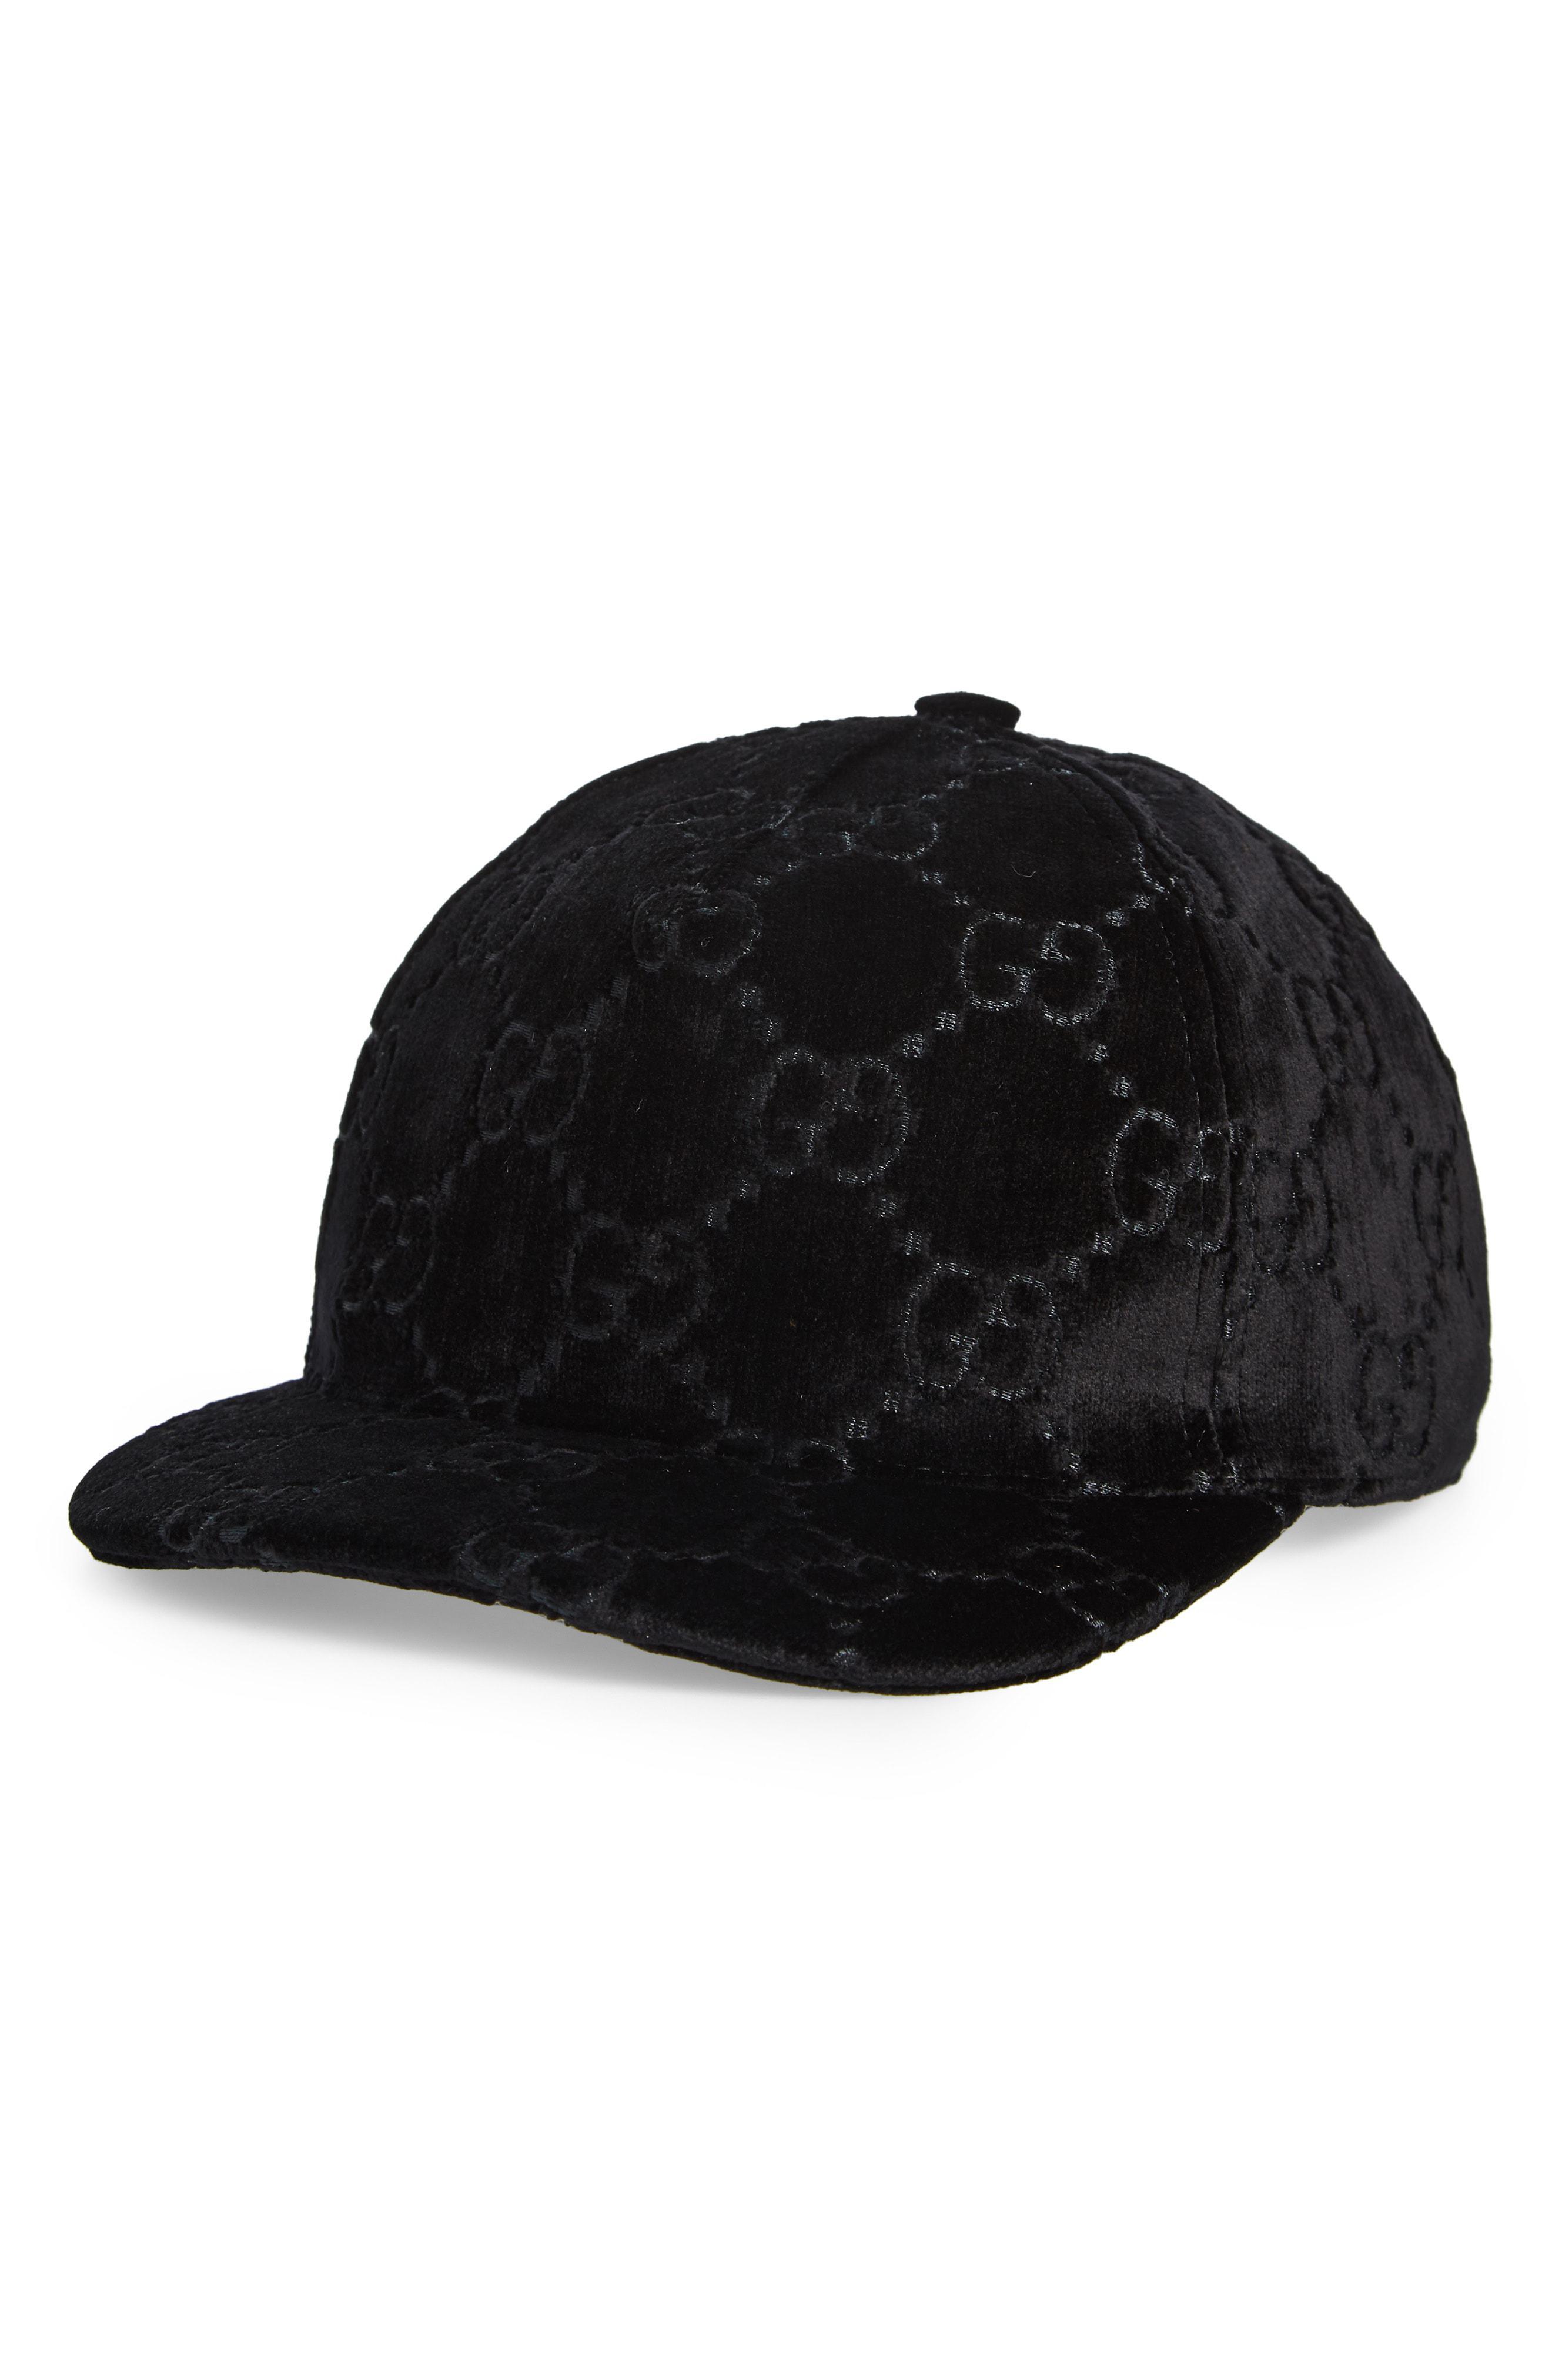 e41fa78cffb Gucci - Black Logo Embroidered Velvet Baseball Cap - Lyst. View fullscreen